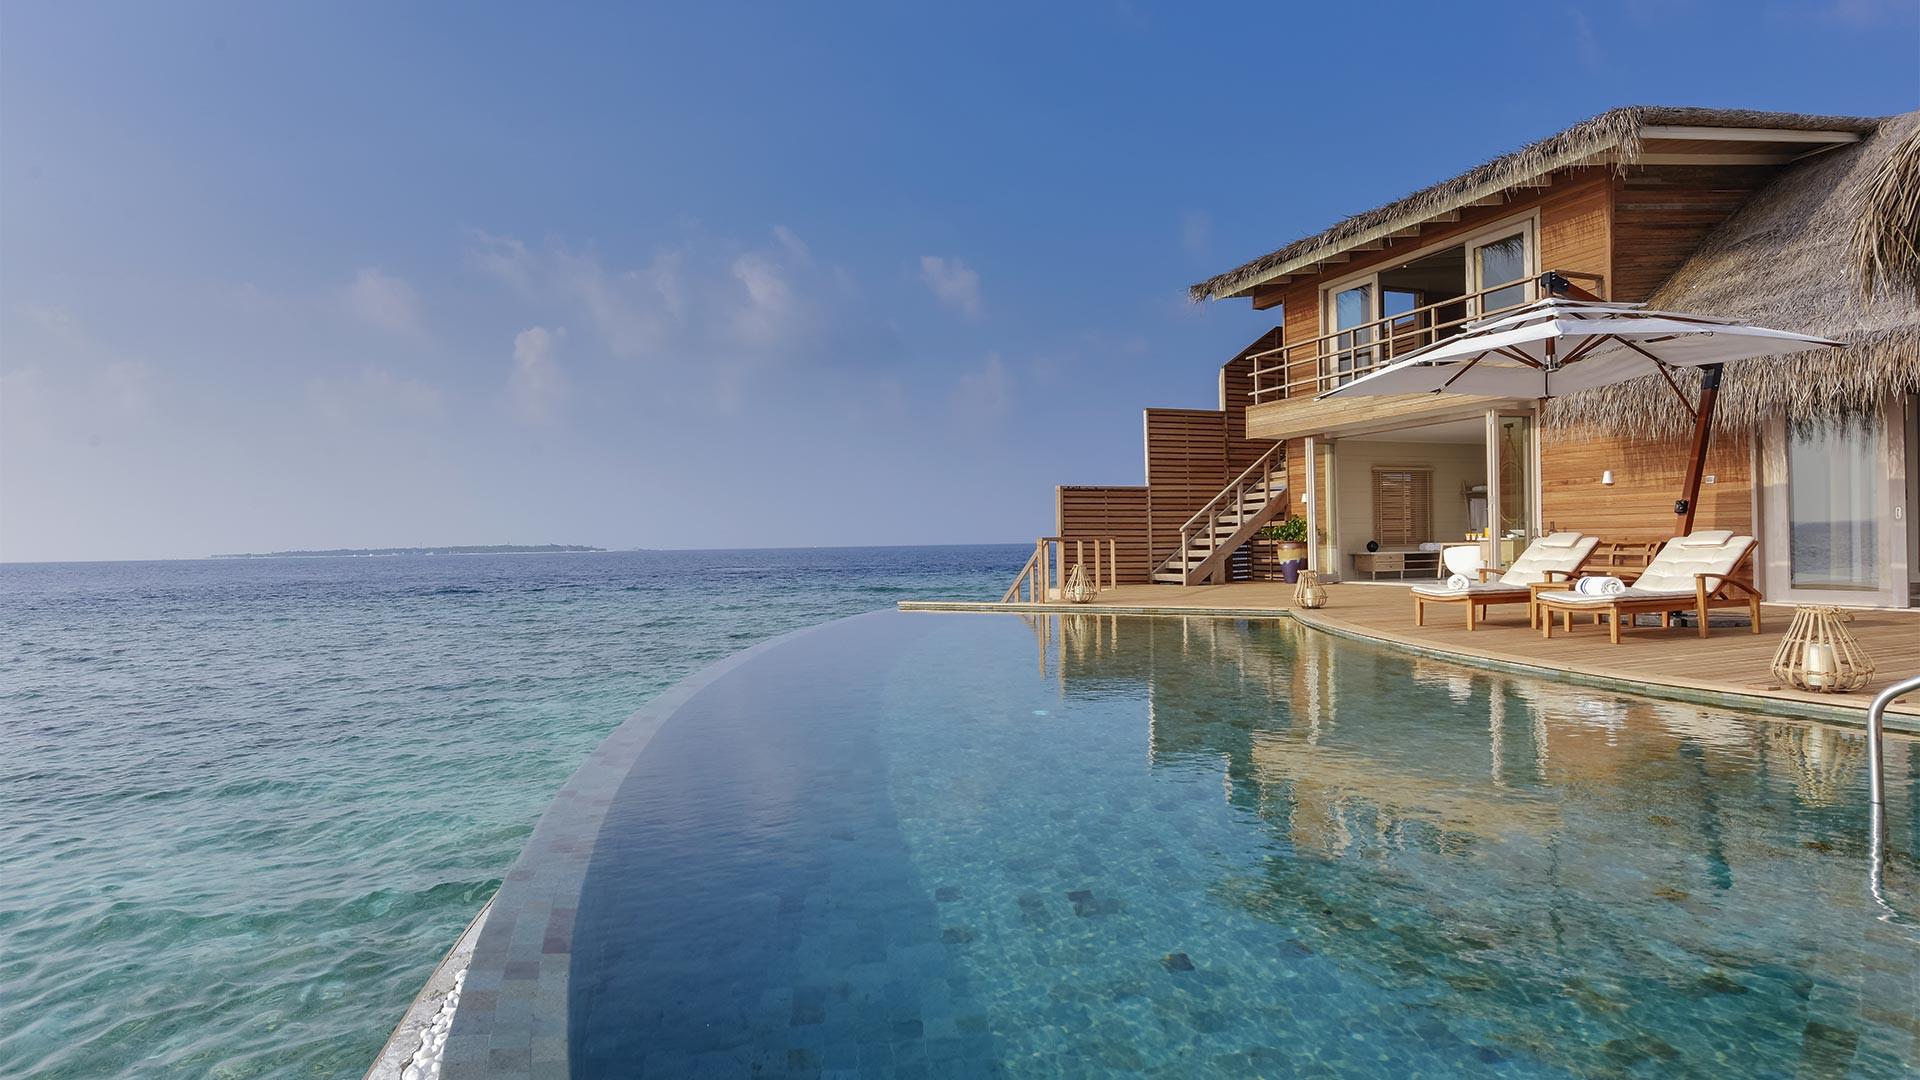 Milaidhoo Island Maldives' new Ocean Residence